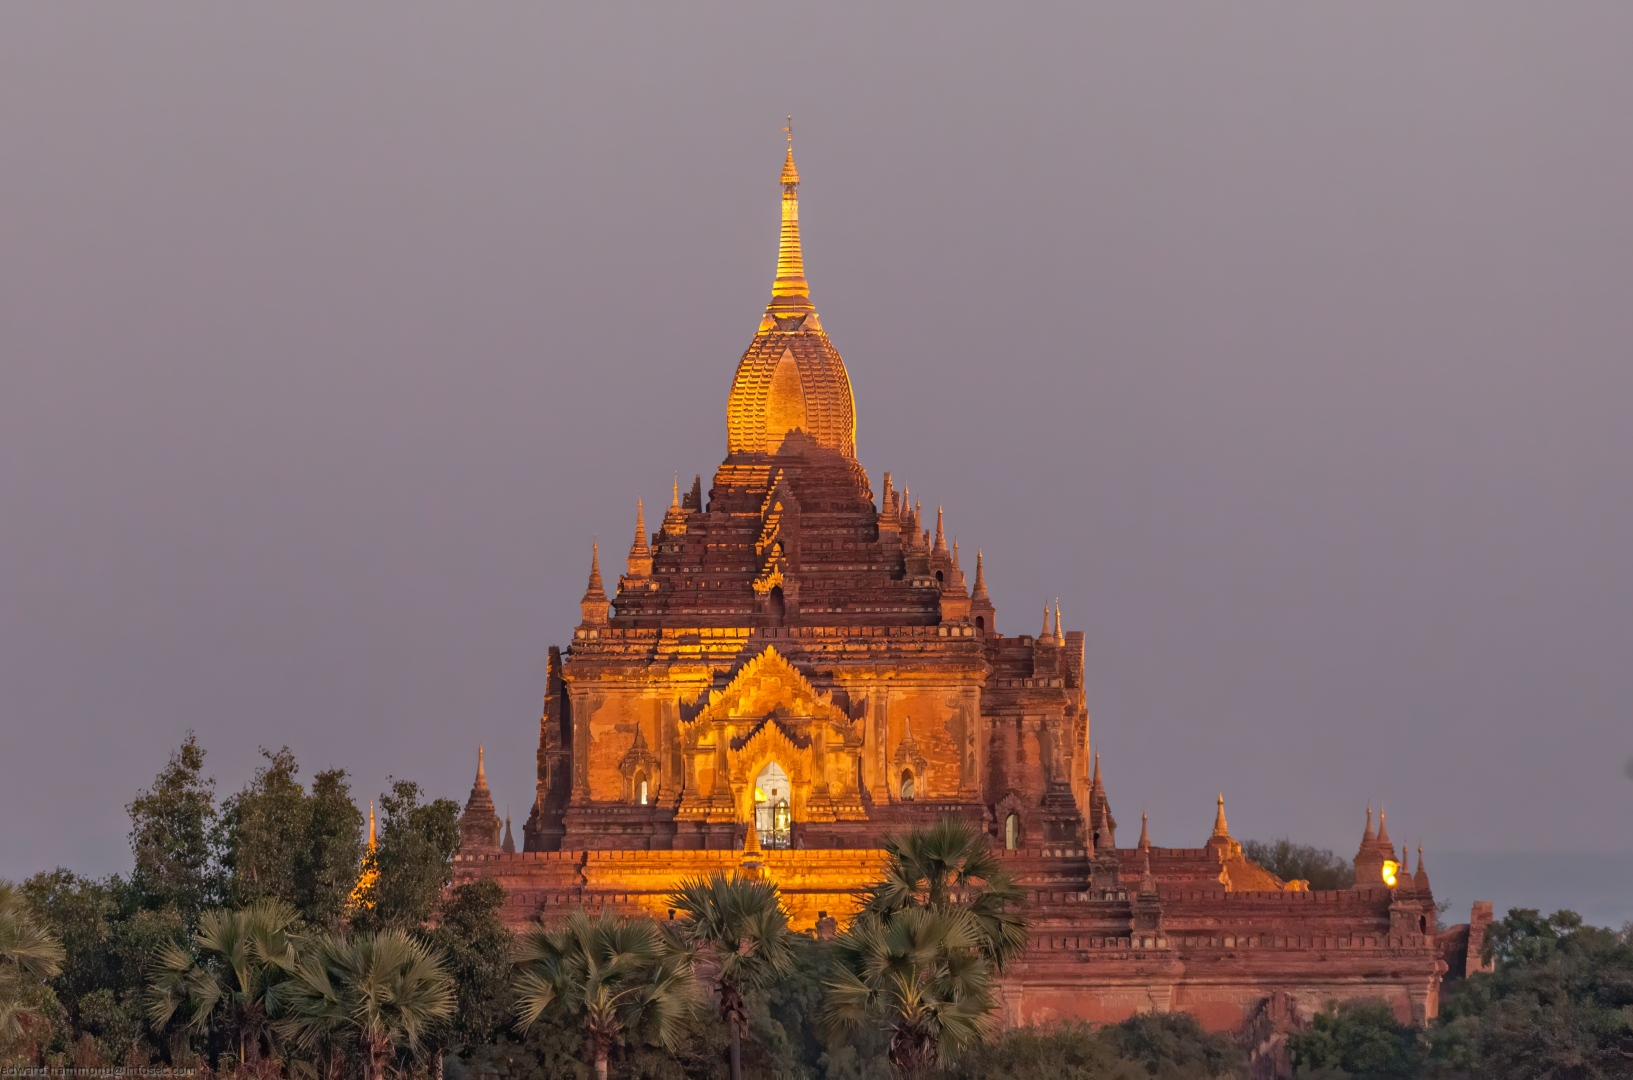 The Sulamani, Old Bagan, Myanmar